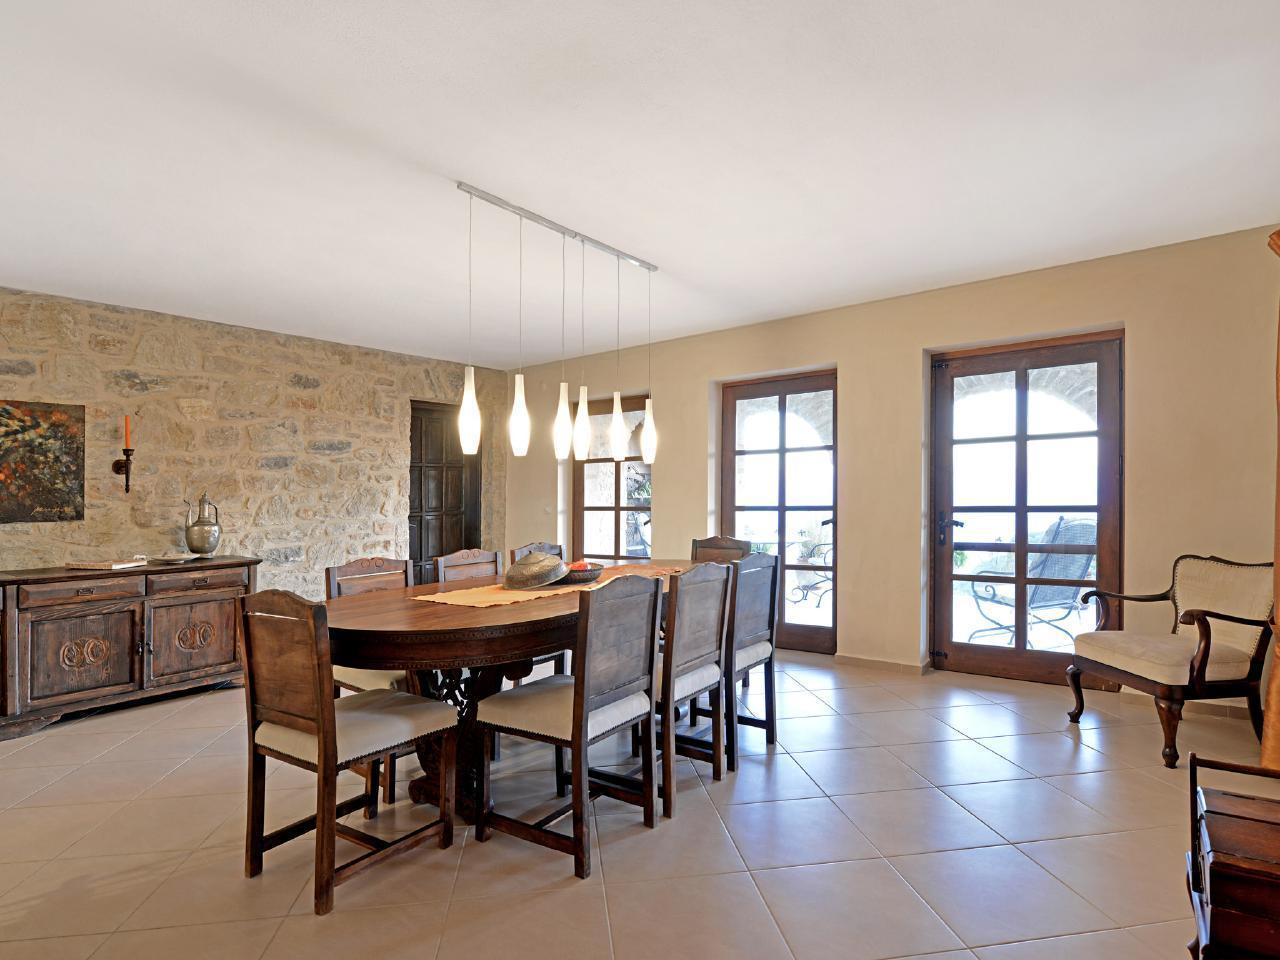 Maison de vacances Exklusives Chalet, romantisch am Berghang und Meer gelegen (2506674), Mesudiye, , Région Egéenne, Turquie, image 12